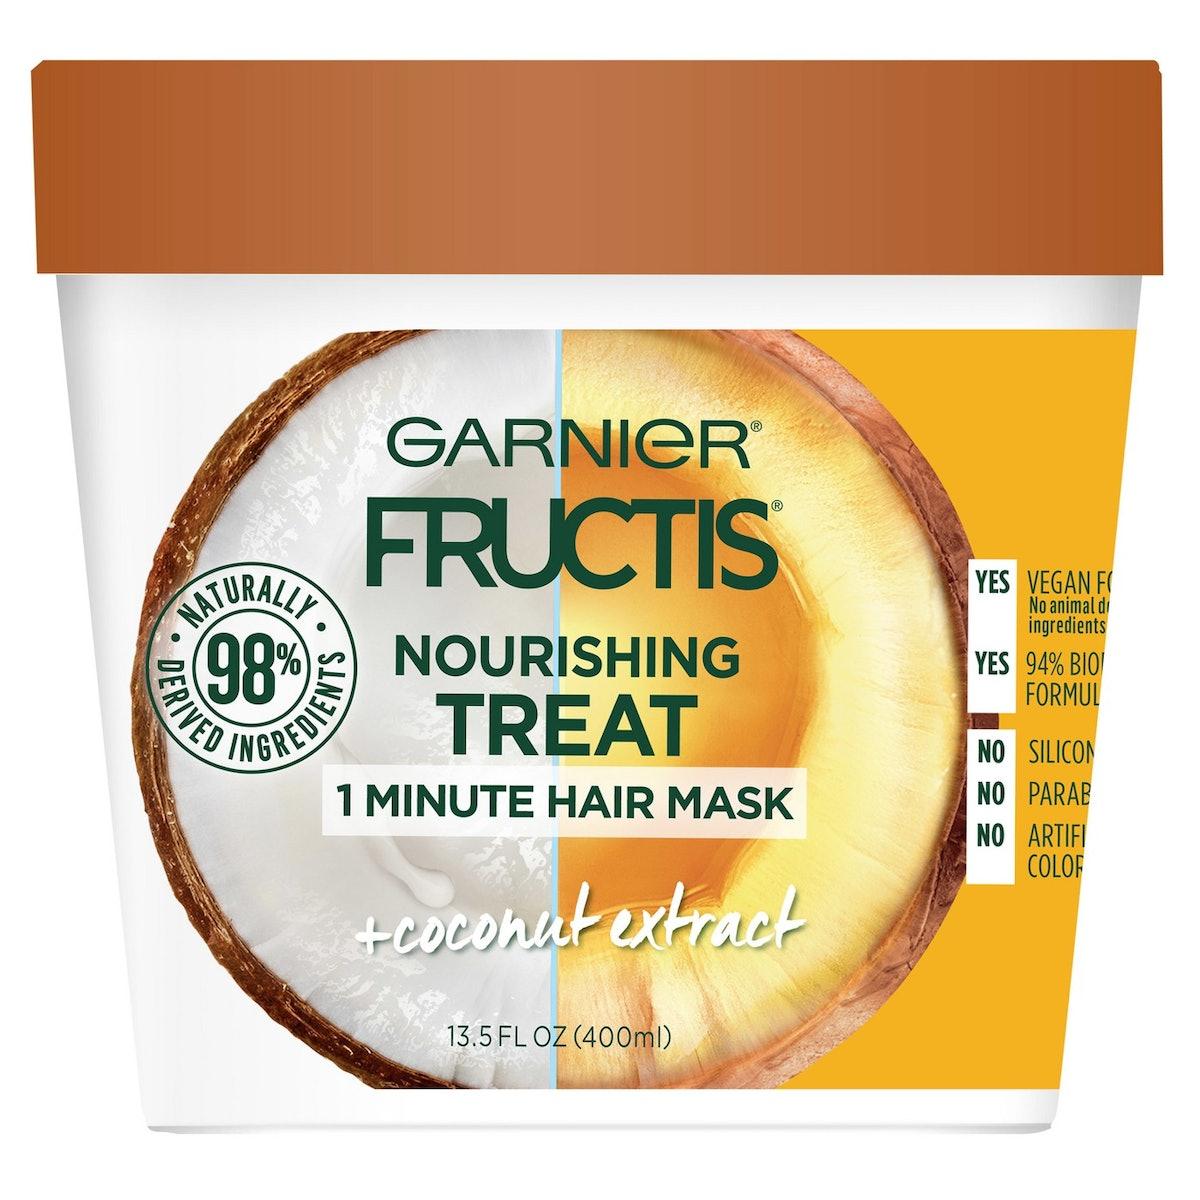 Garnier Fructis Hair Mask + Coconut Extract